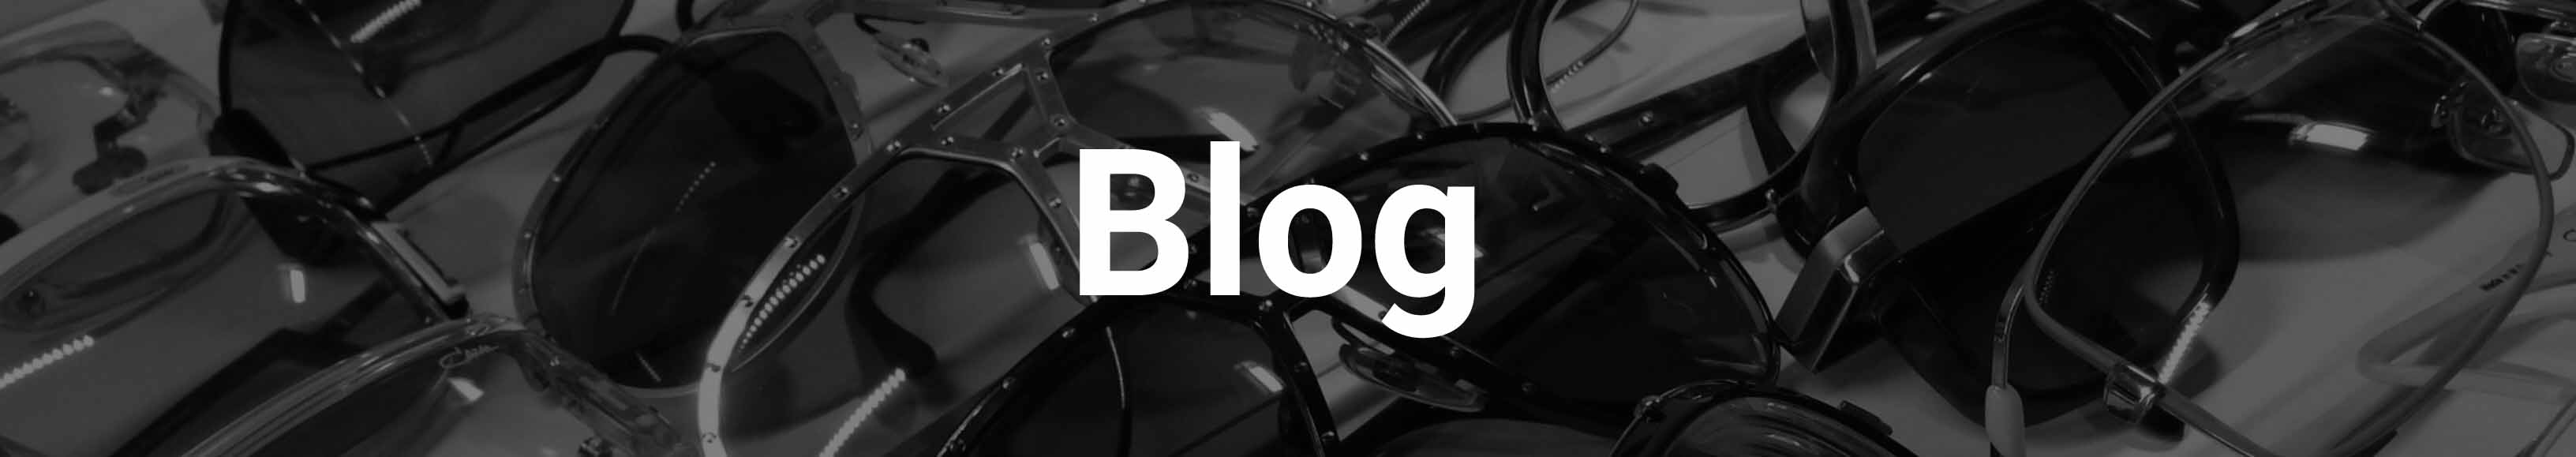 Banner-Blog3